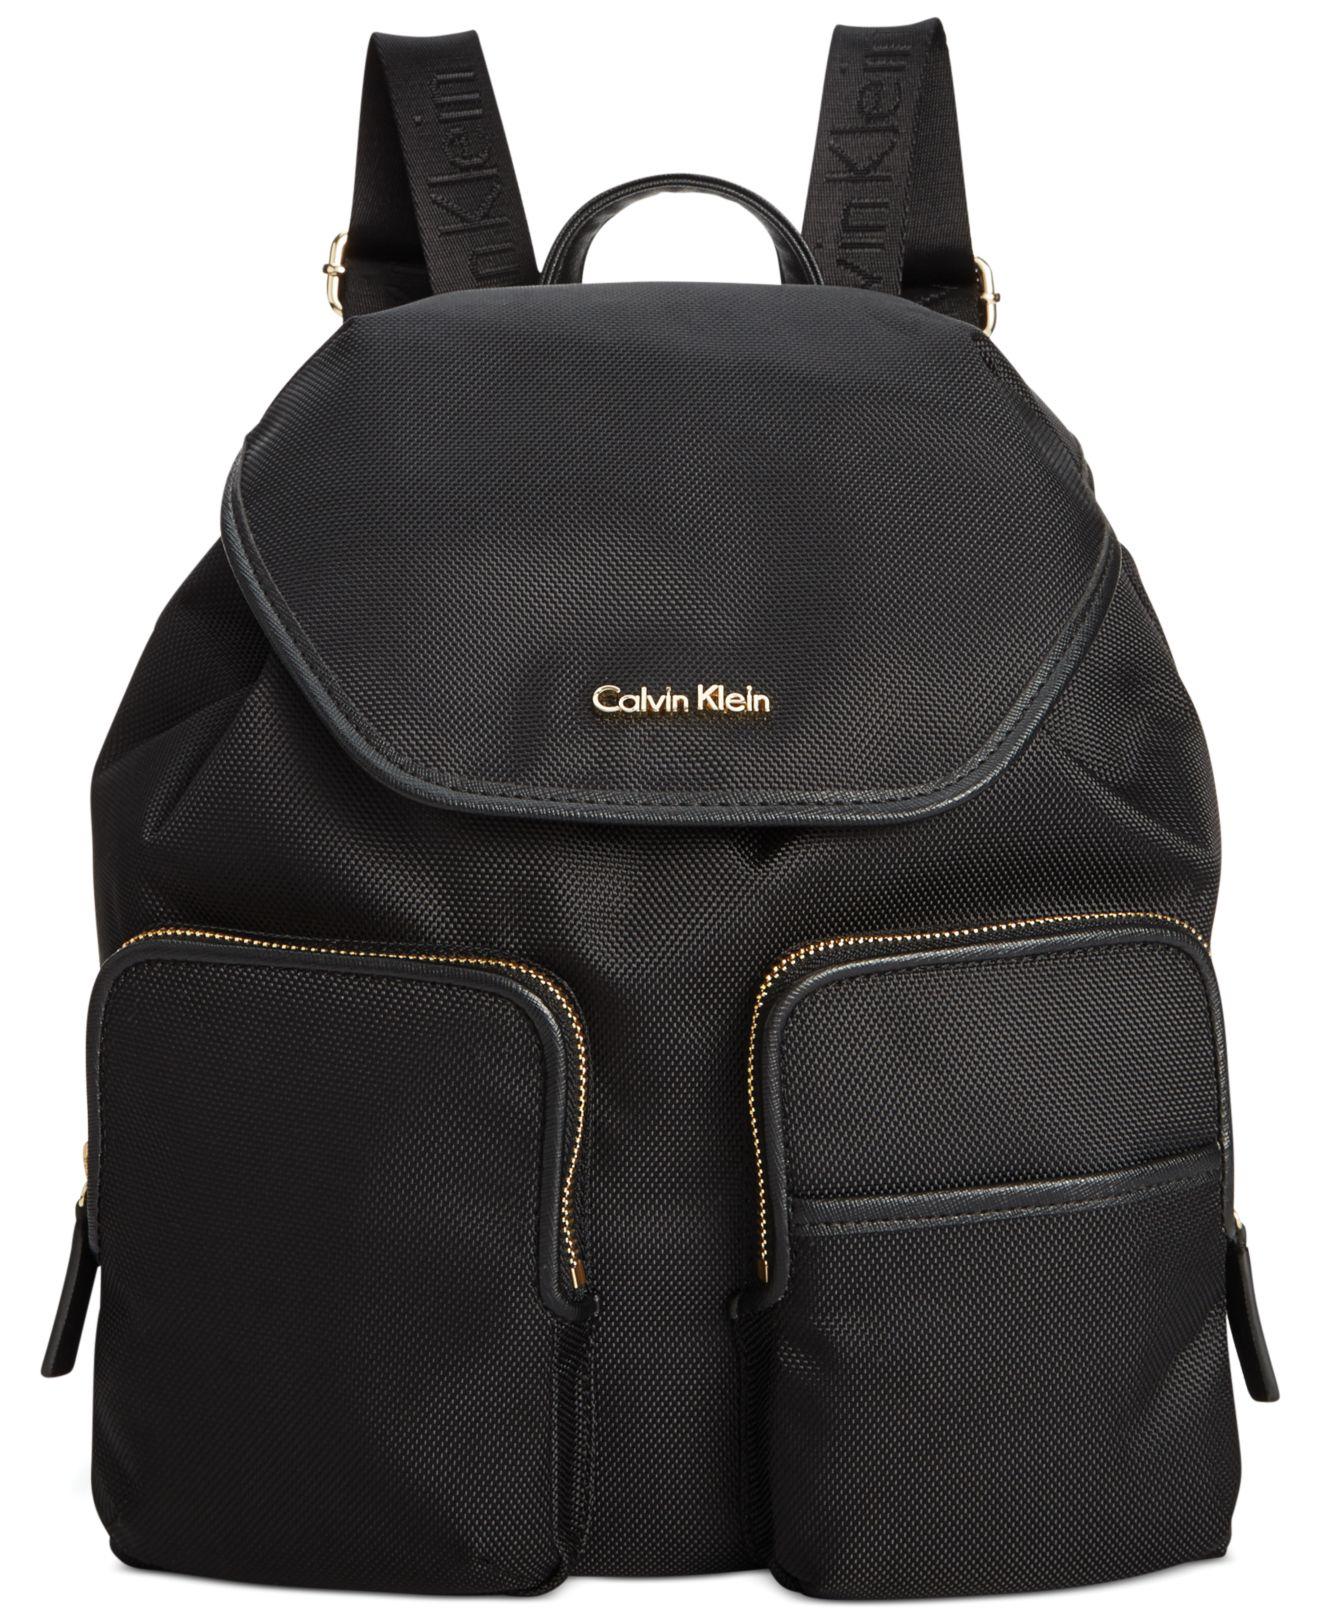 calvin klein parker ballistic nylon backpack in gray lyst. Black Bedroom Furniture Sets. Home Design Ideas